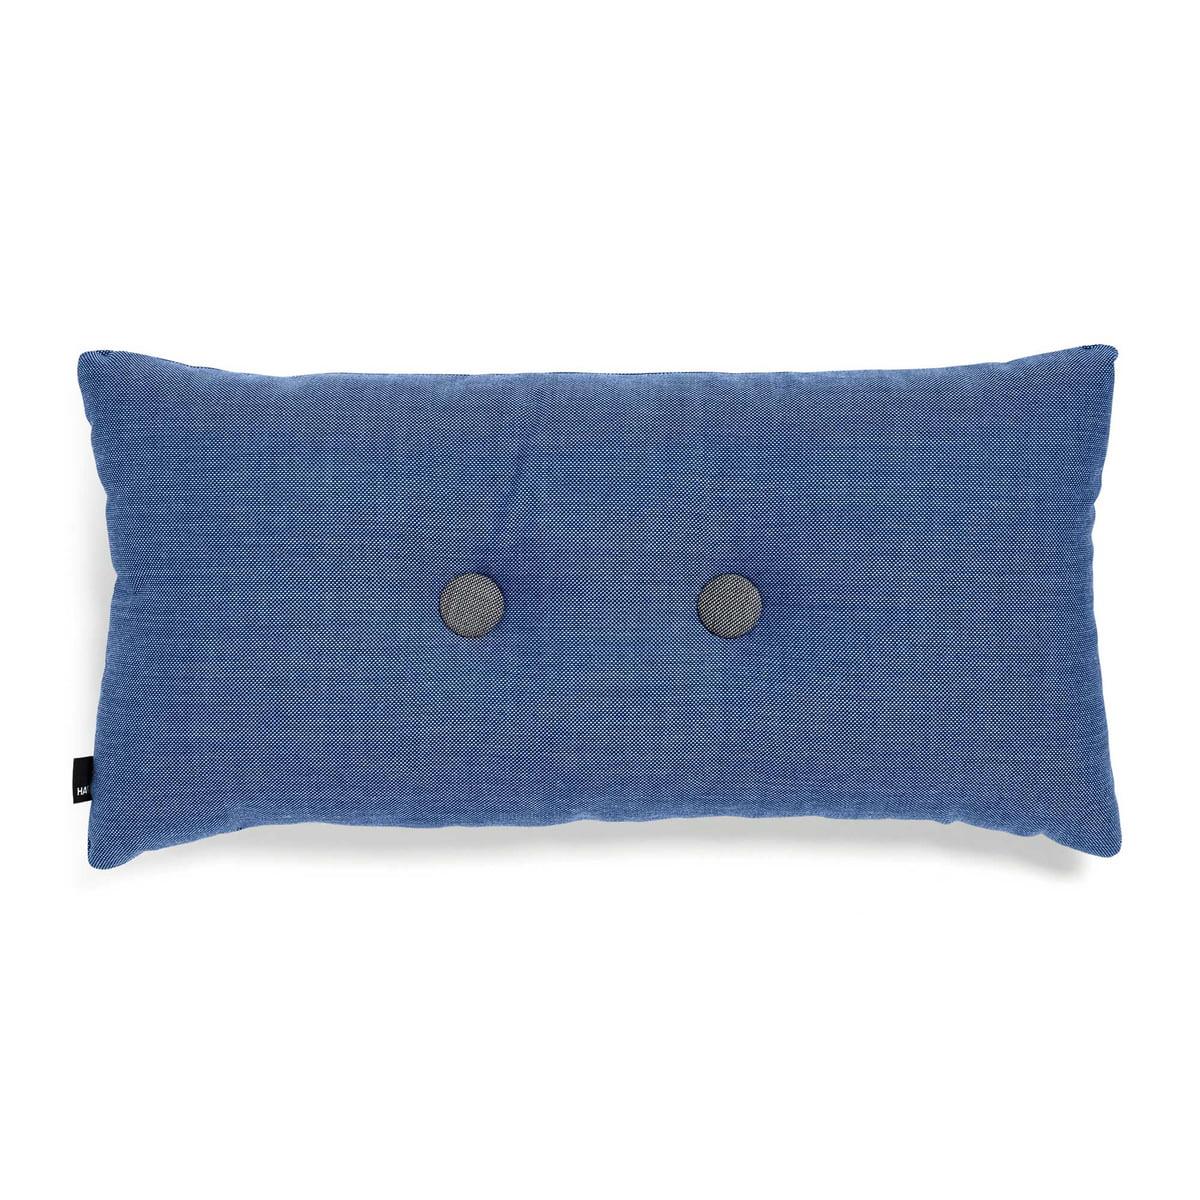 2x2 dot kissen 70 x 36 cm surface von hay connox. Black Bedroom Furniture Sets. Home Design Ideas